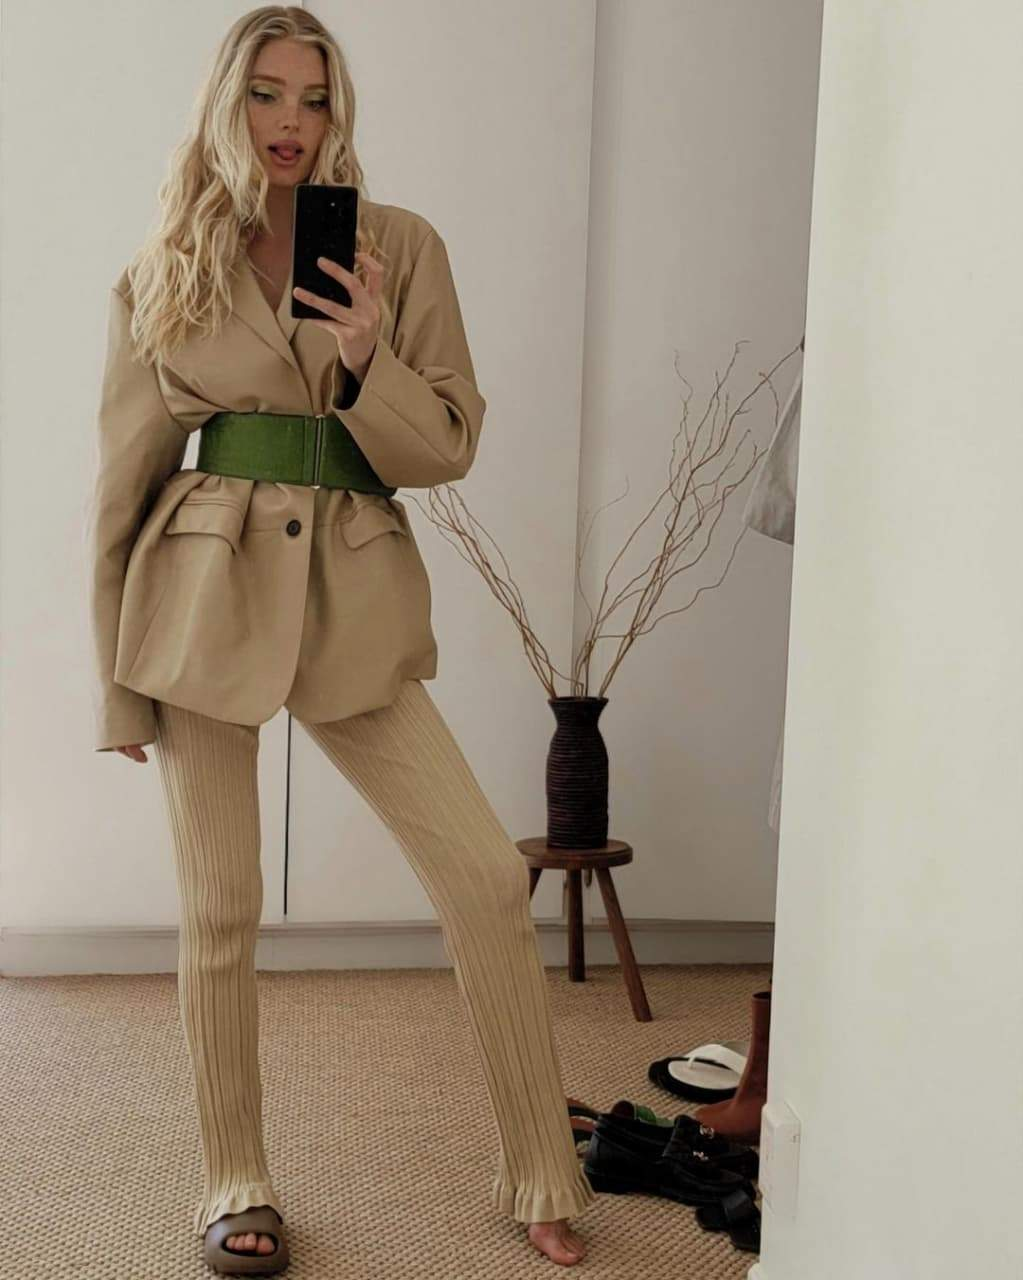 Ельза Госк приміряла стильний образ / Фото з інстаграму